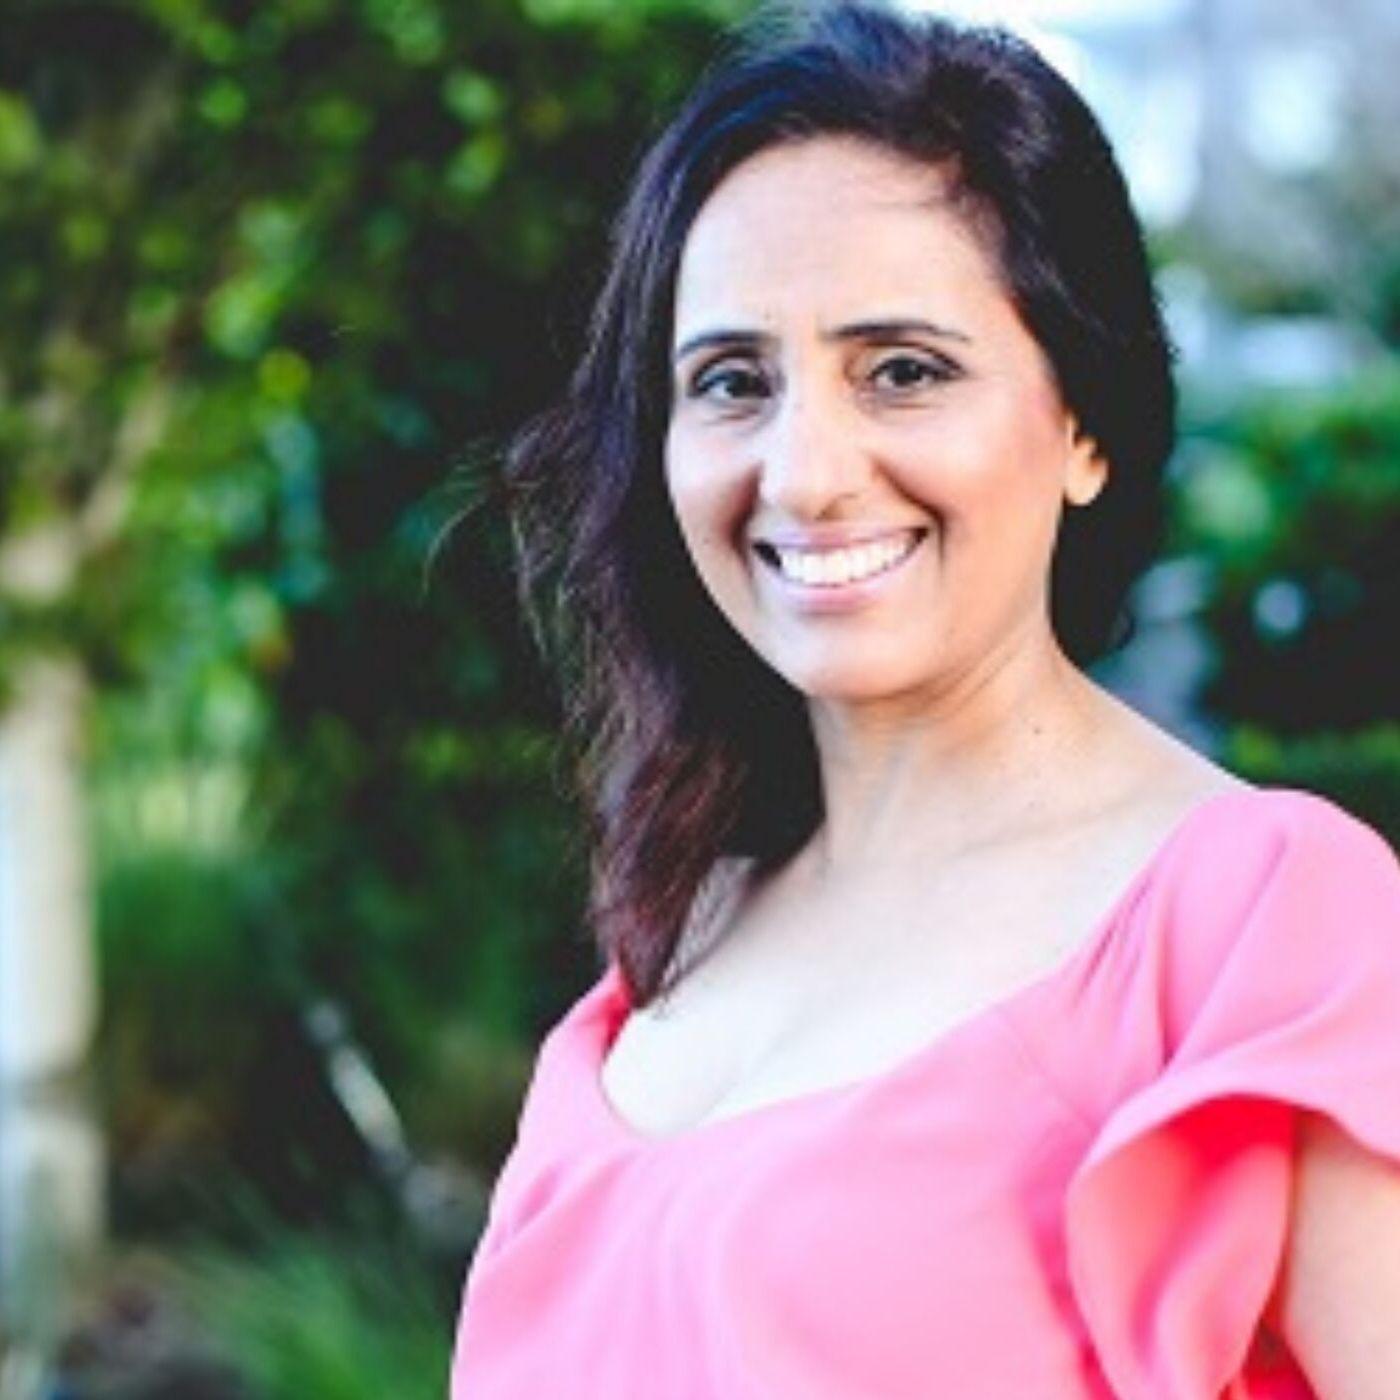 Nina Thiara, Divorce Coach in Clarity in Divorce